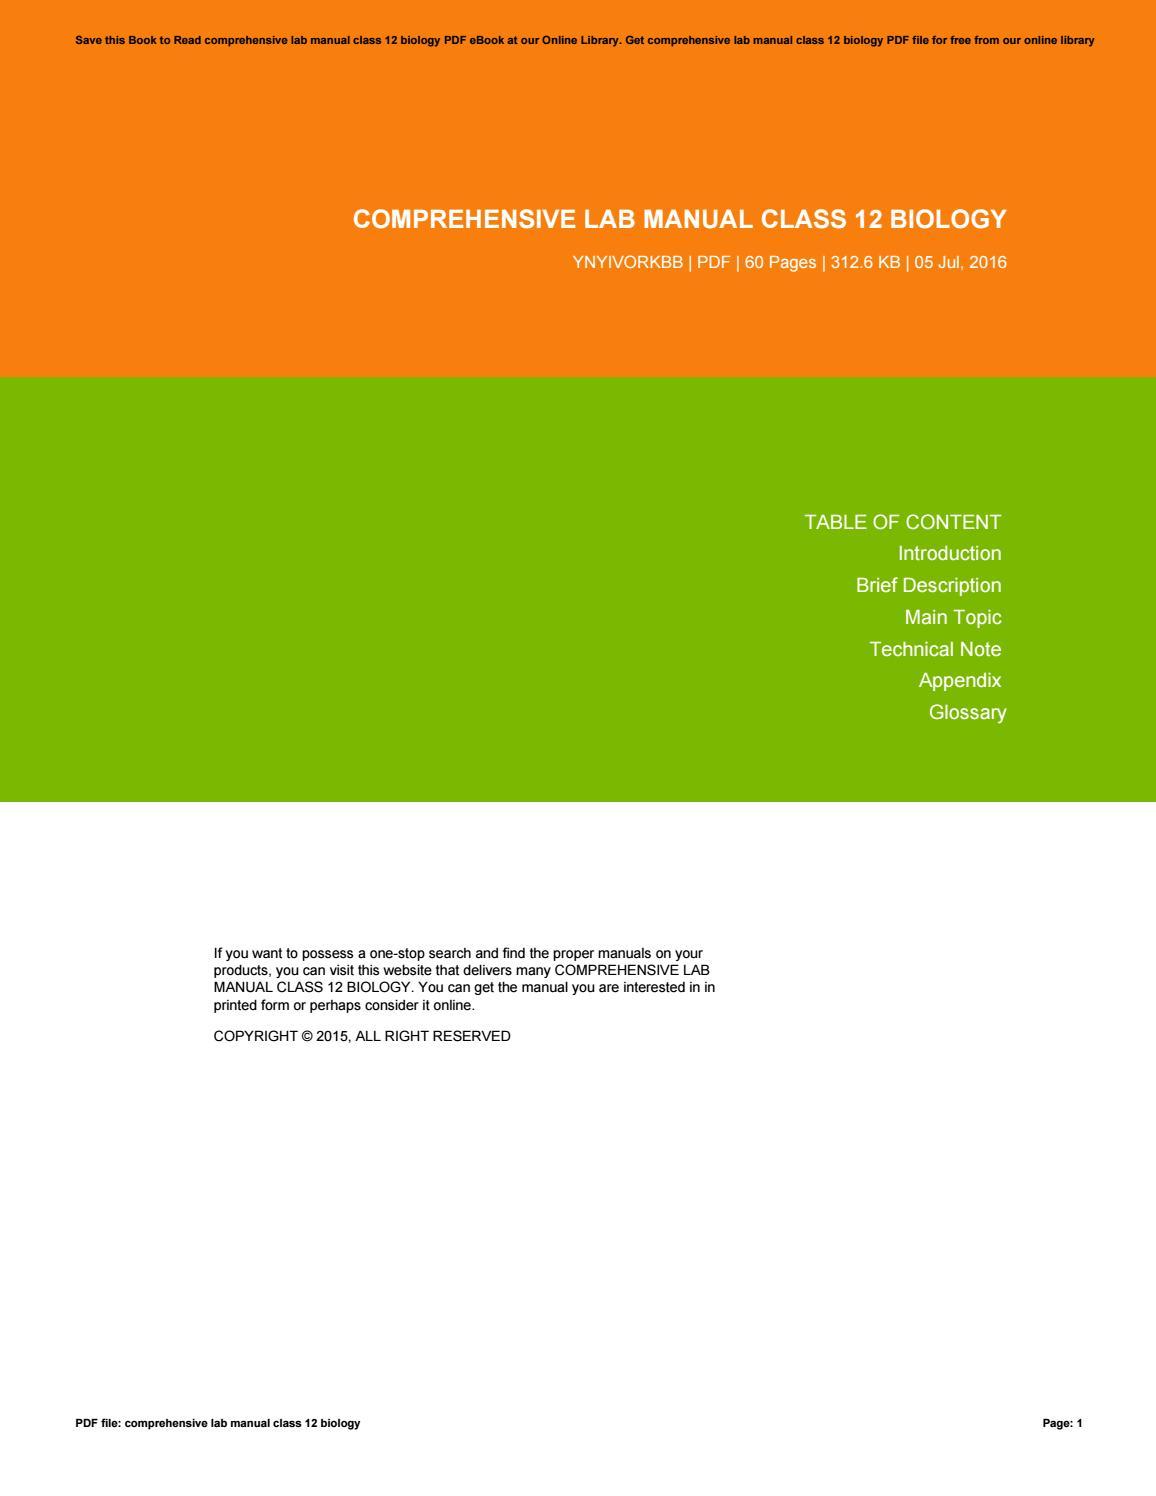 Comprehensive lab manual class 12 biology by HelenBailey - issuu